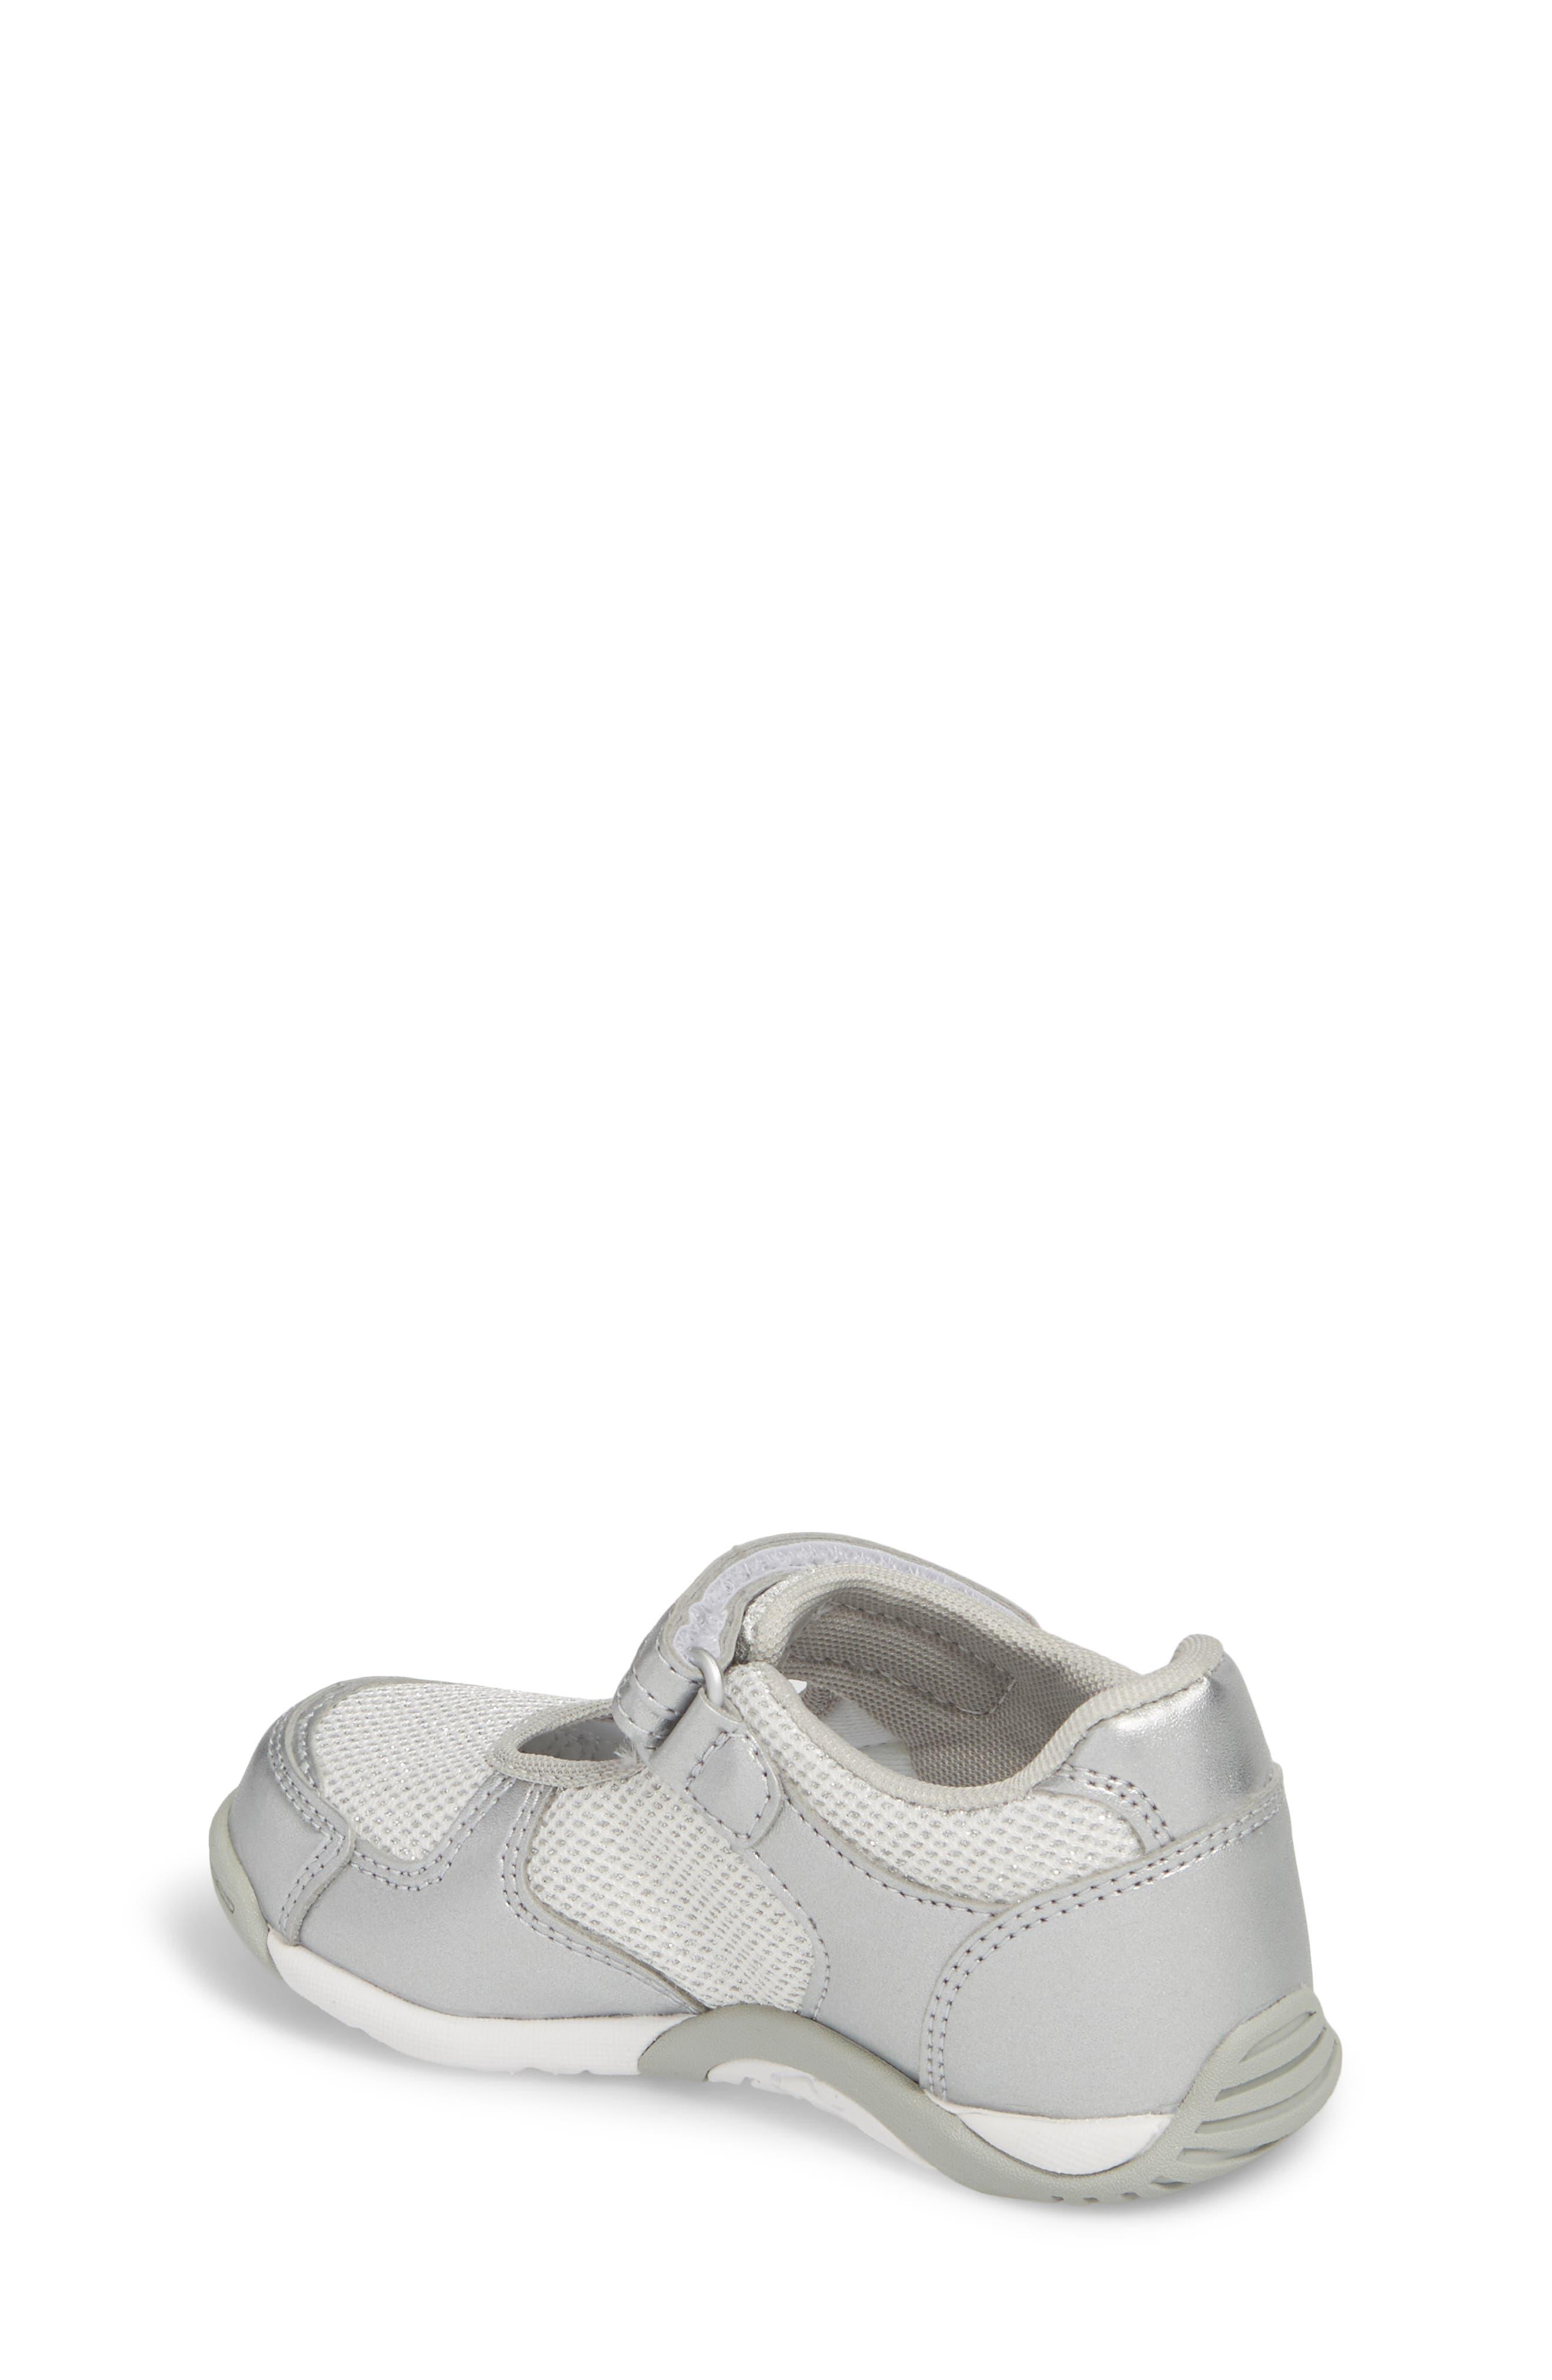 TSUKIHOSHI, Twinkle Washable Sneaker, Alternate thumbnail 2, color, SILVER/ SILVER